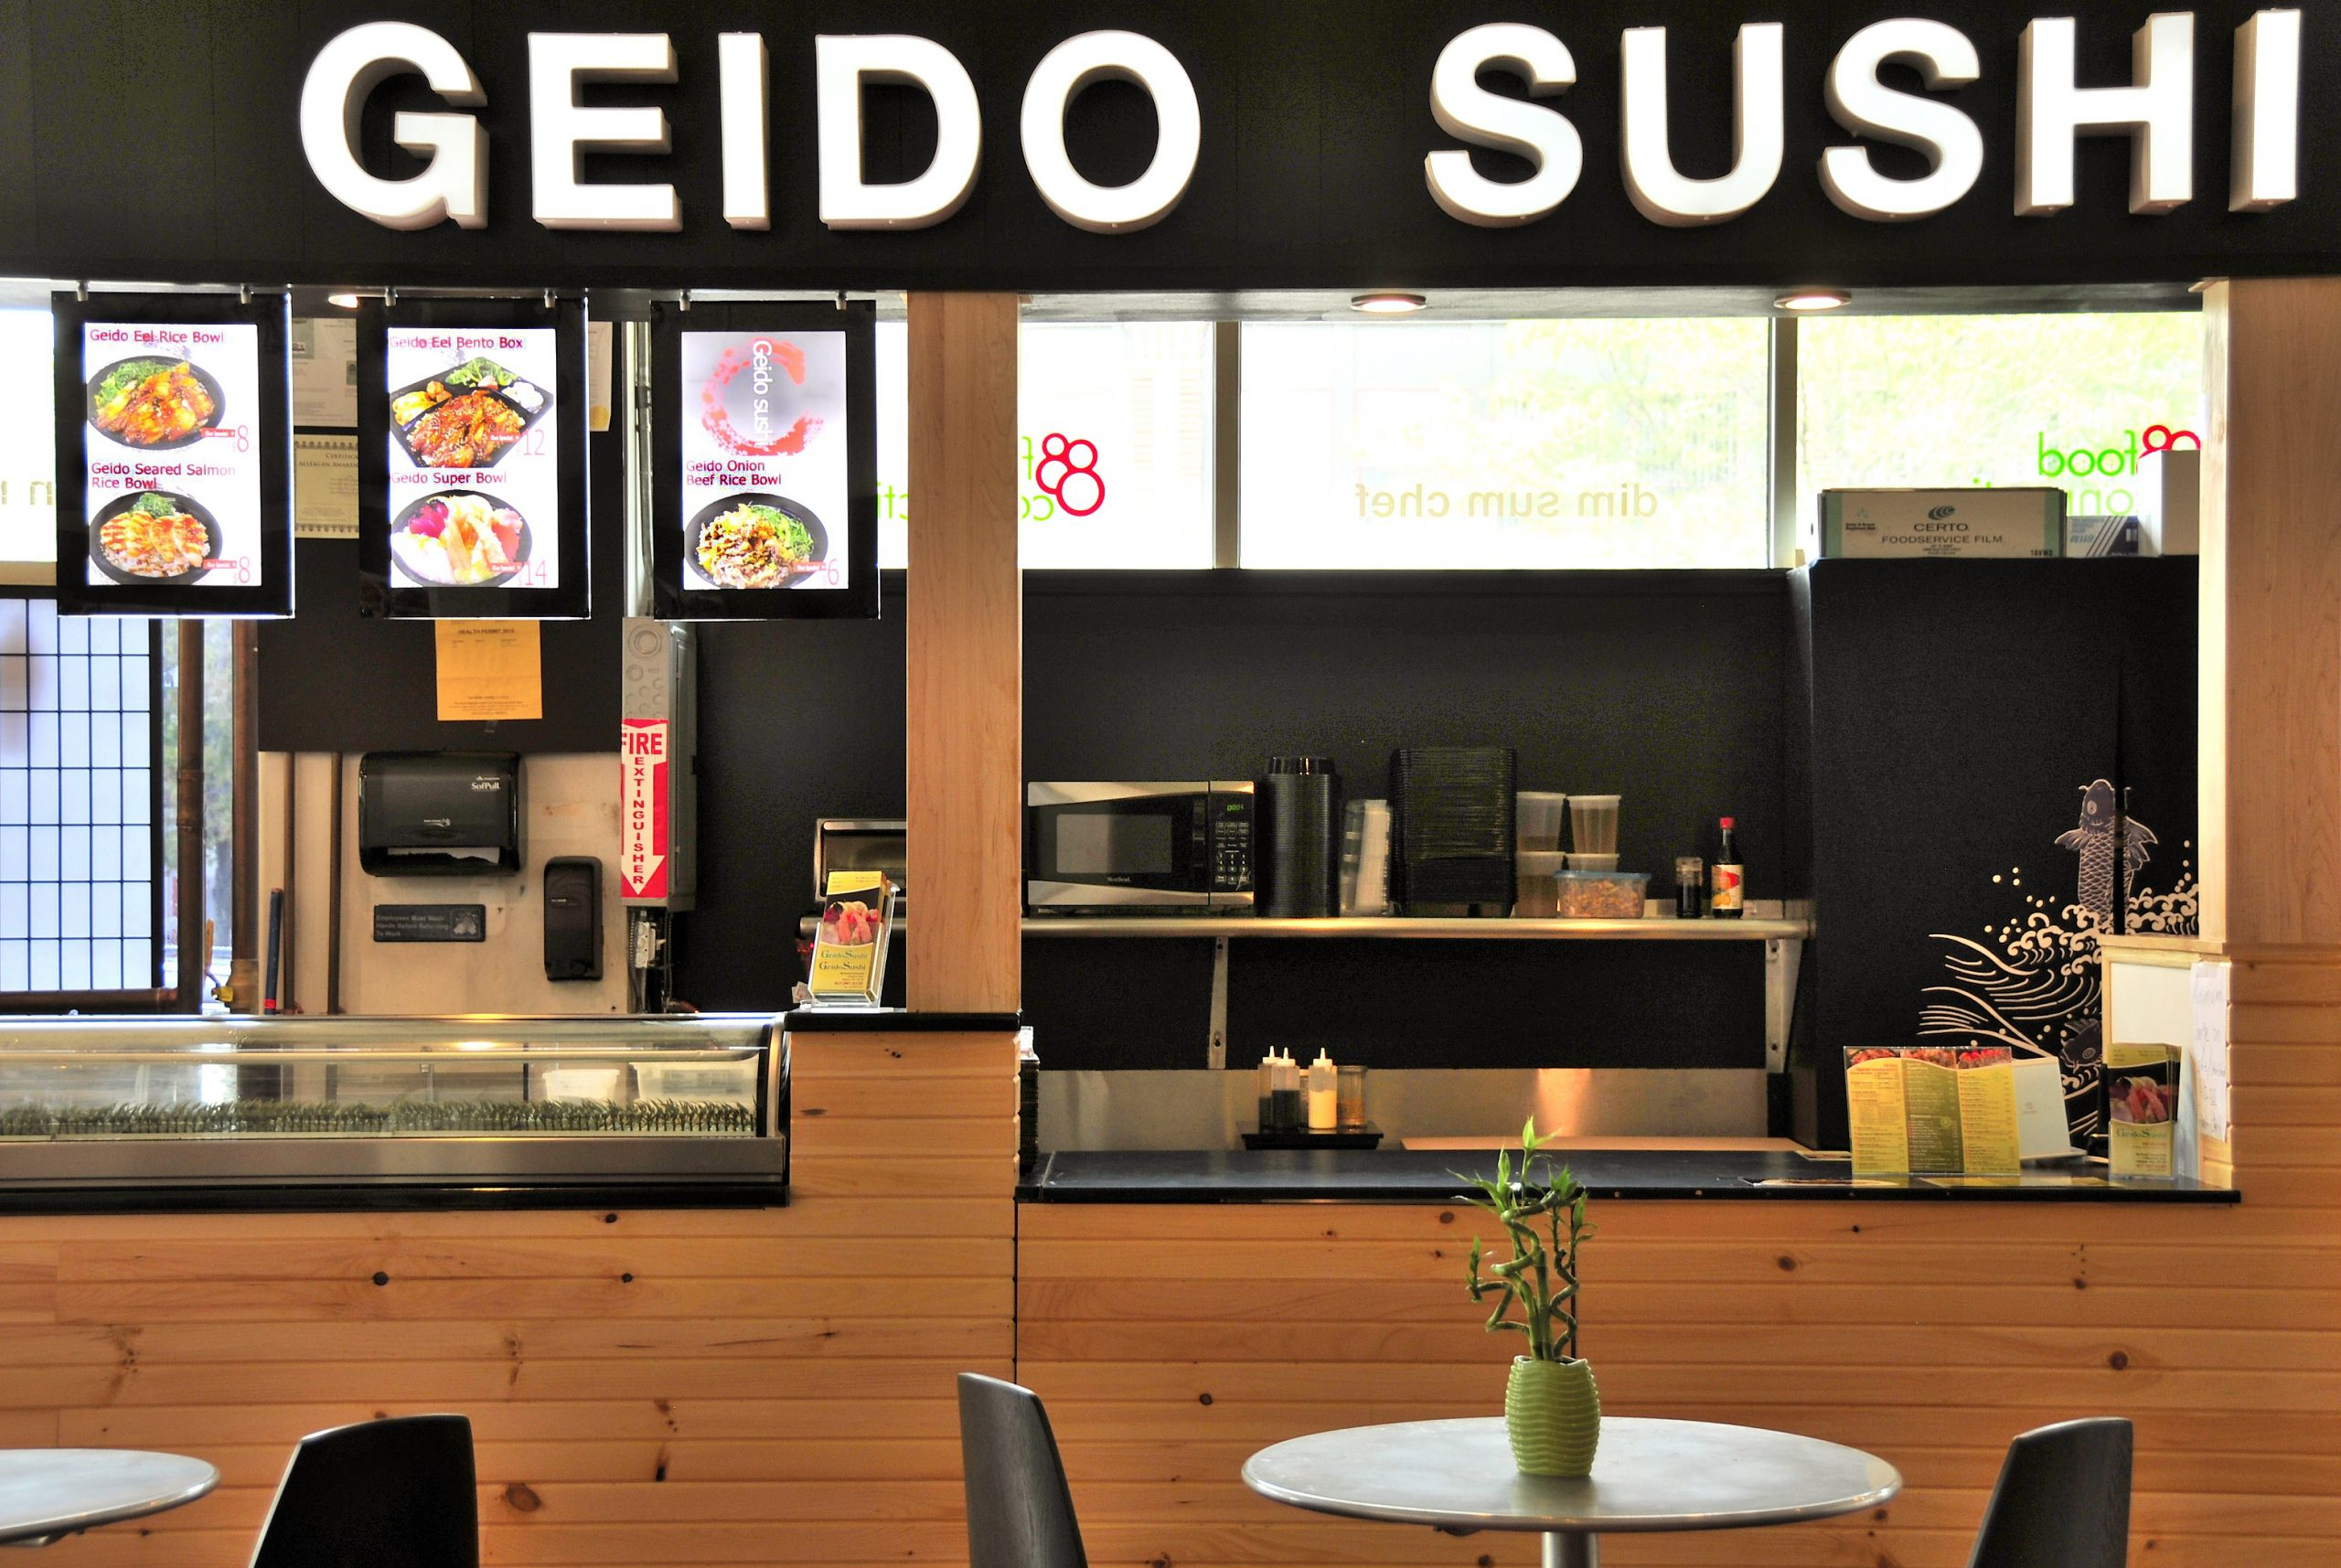 GEIDO_ SUSHI_KIOSK 3